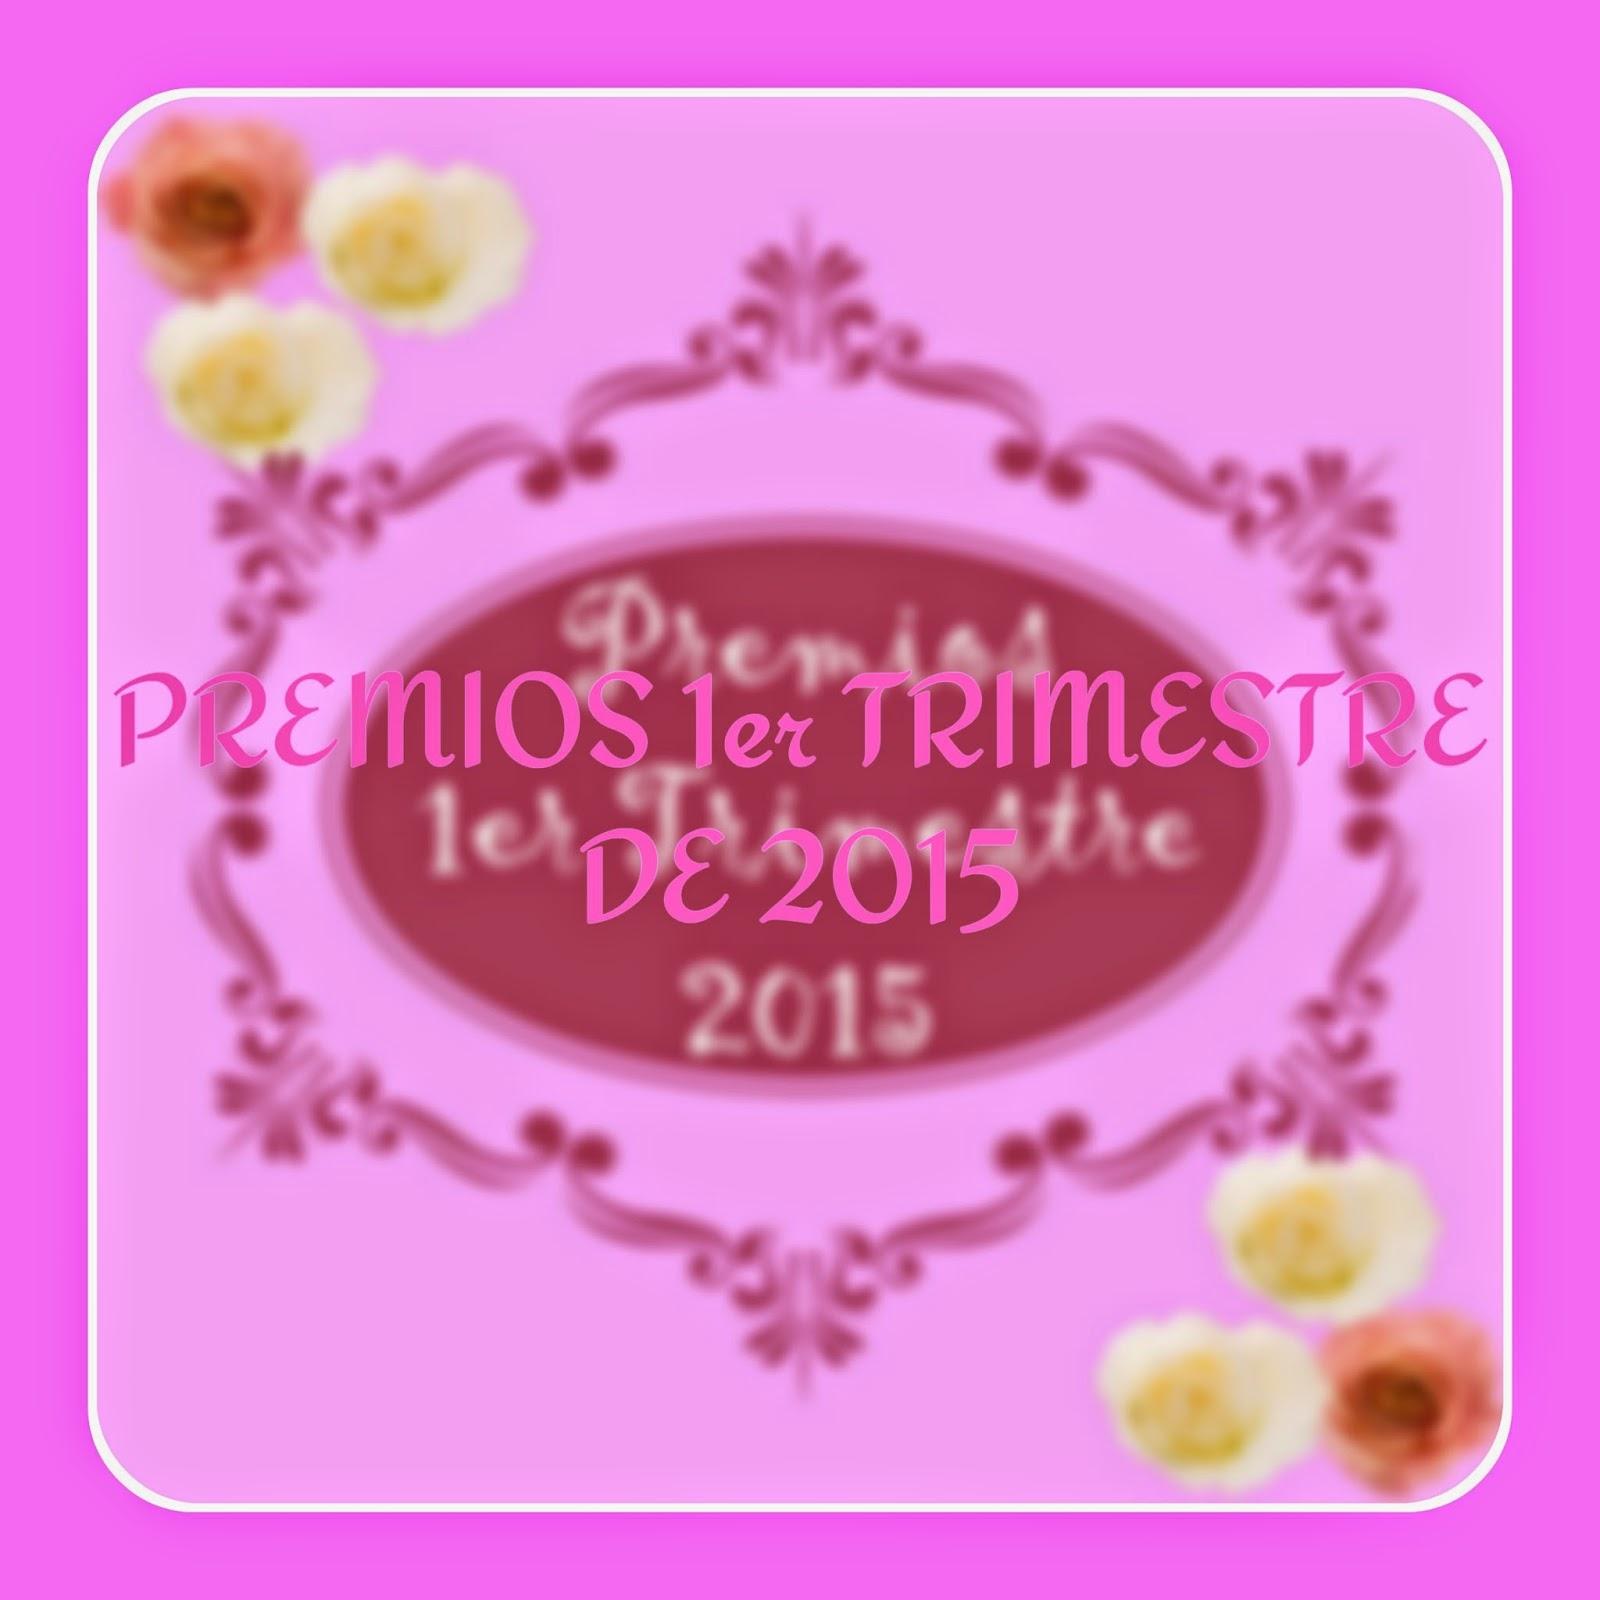 http://pinkturtlenails.blogspot.com.es/2015/04/premios-1er-trimestre-de-2015_22.html